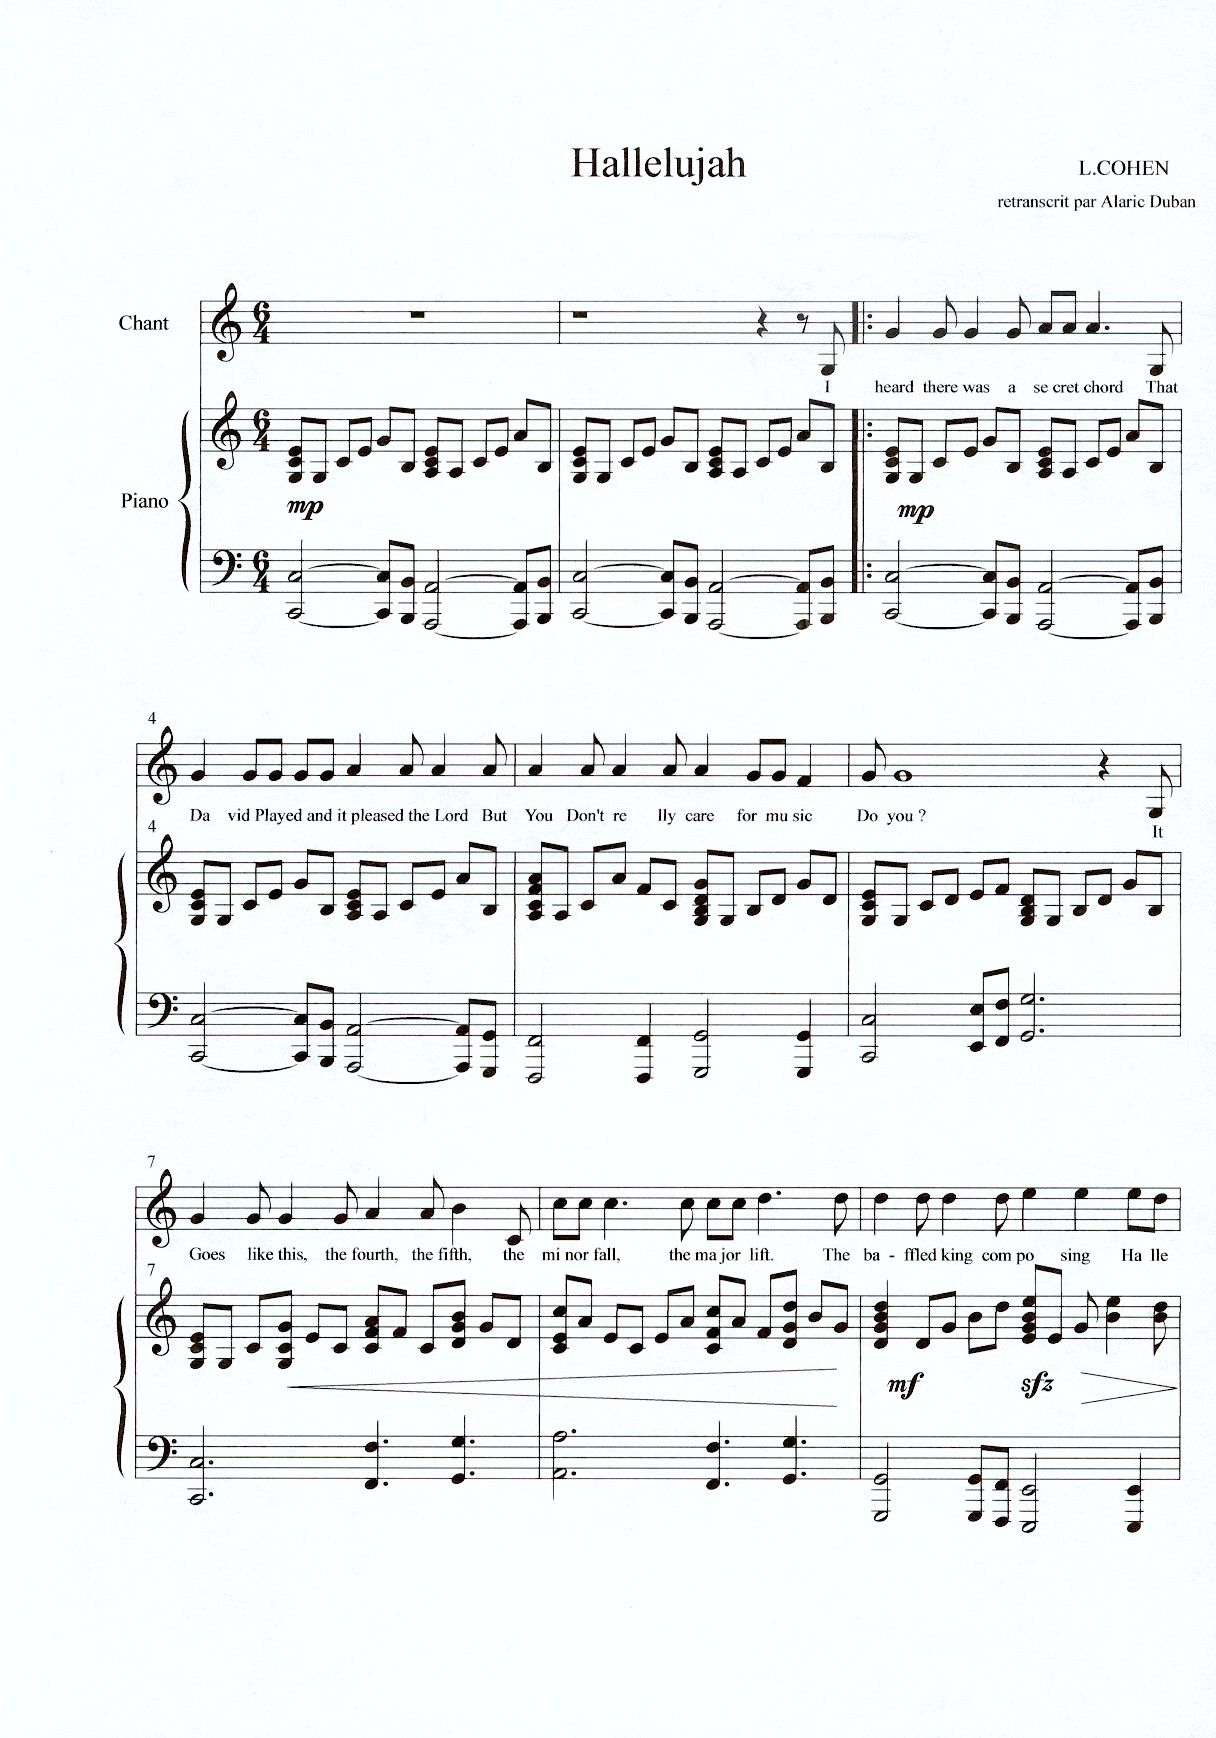 hallelujah chords piano sheet music free